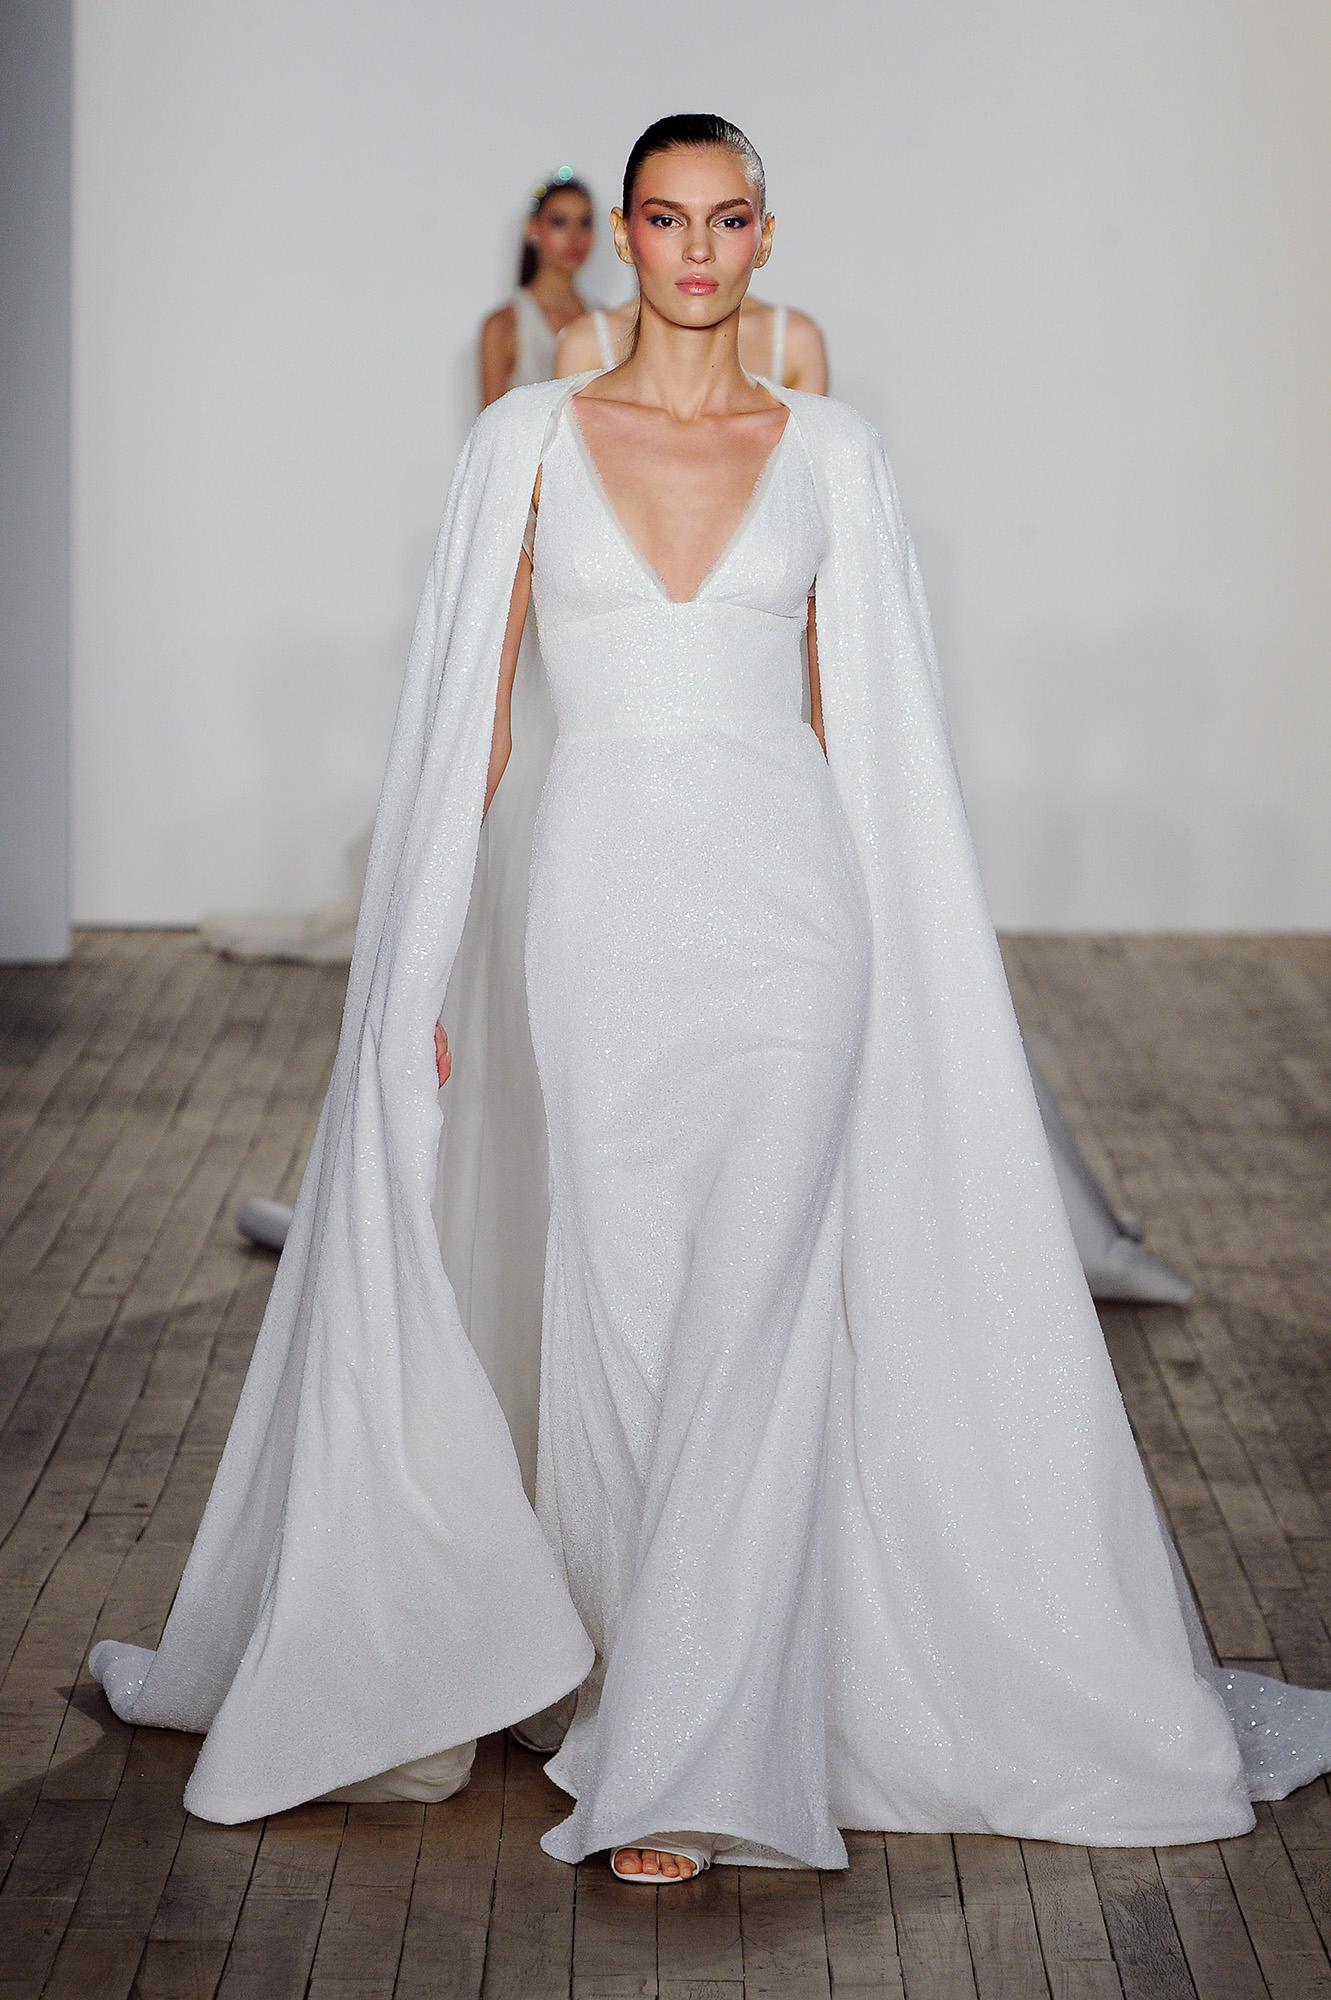 allison webb wedding dress v-neck sparkly cape